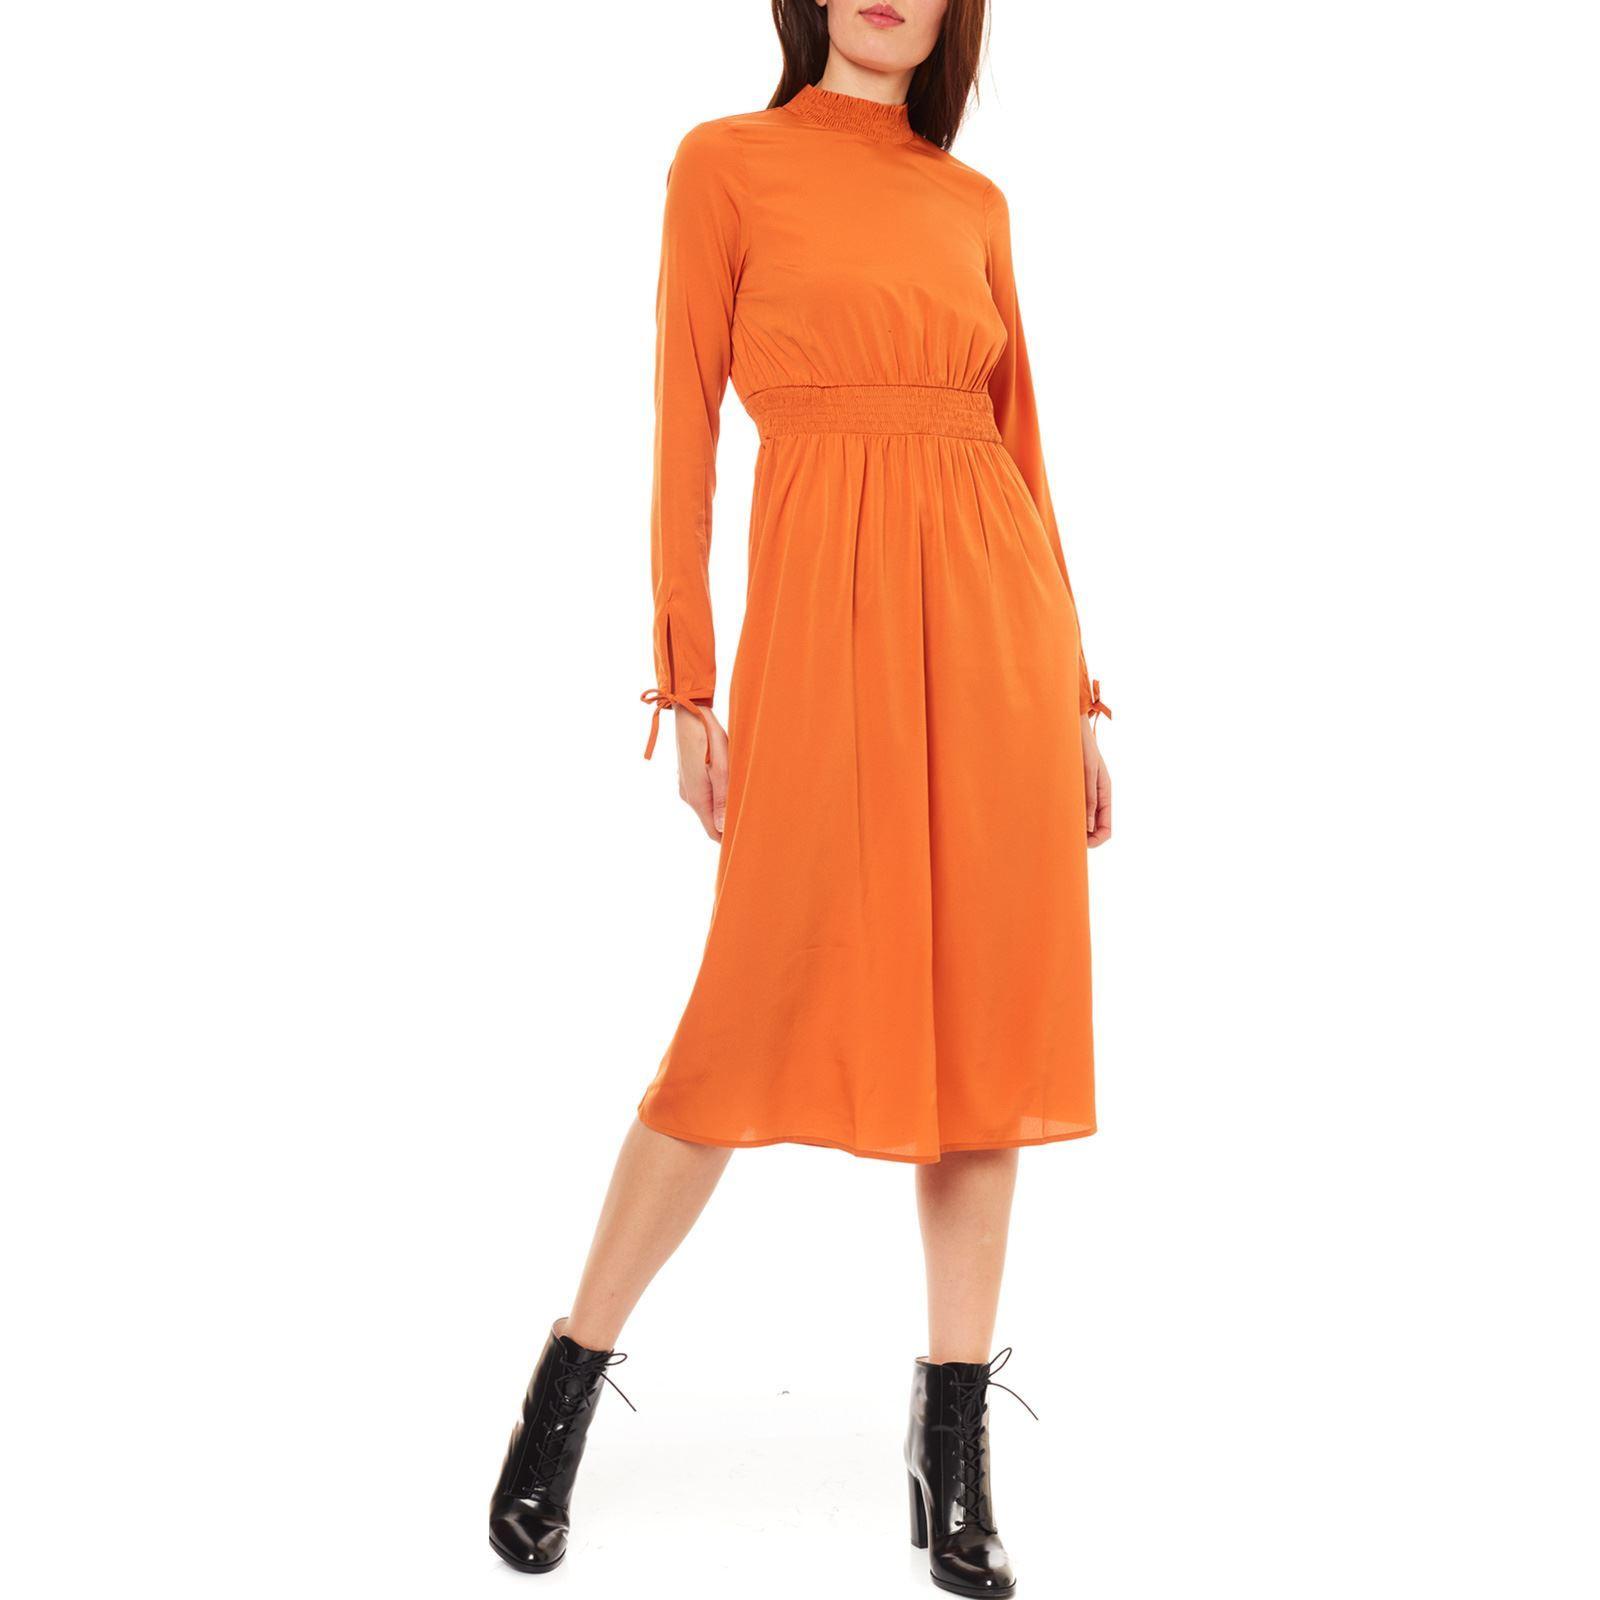 Vero Moda Toscana  Langes Kleid  Orange  Brandalley